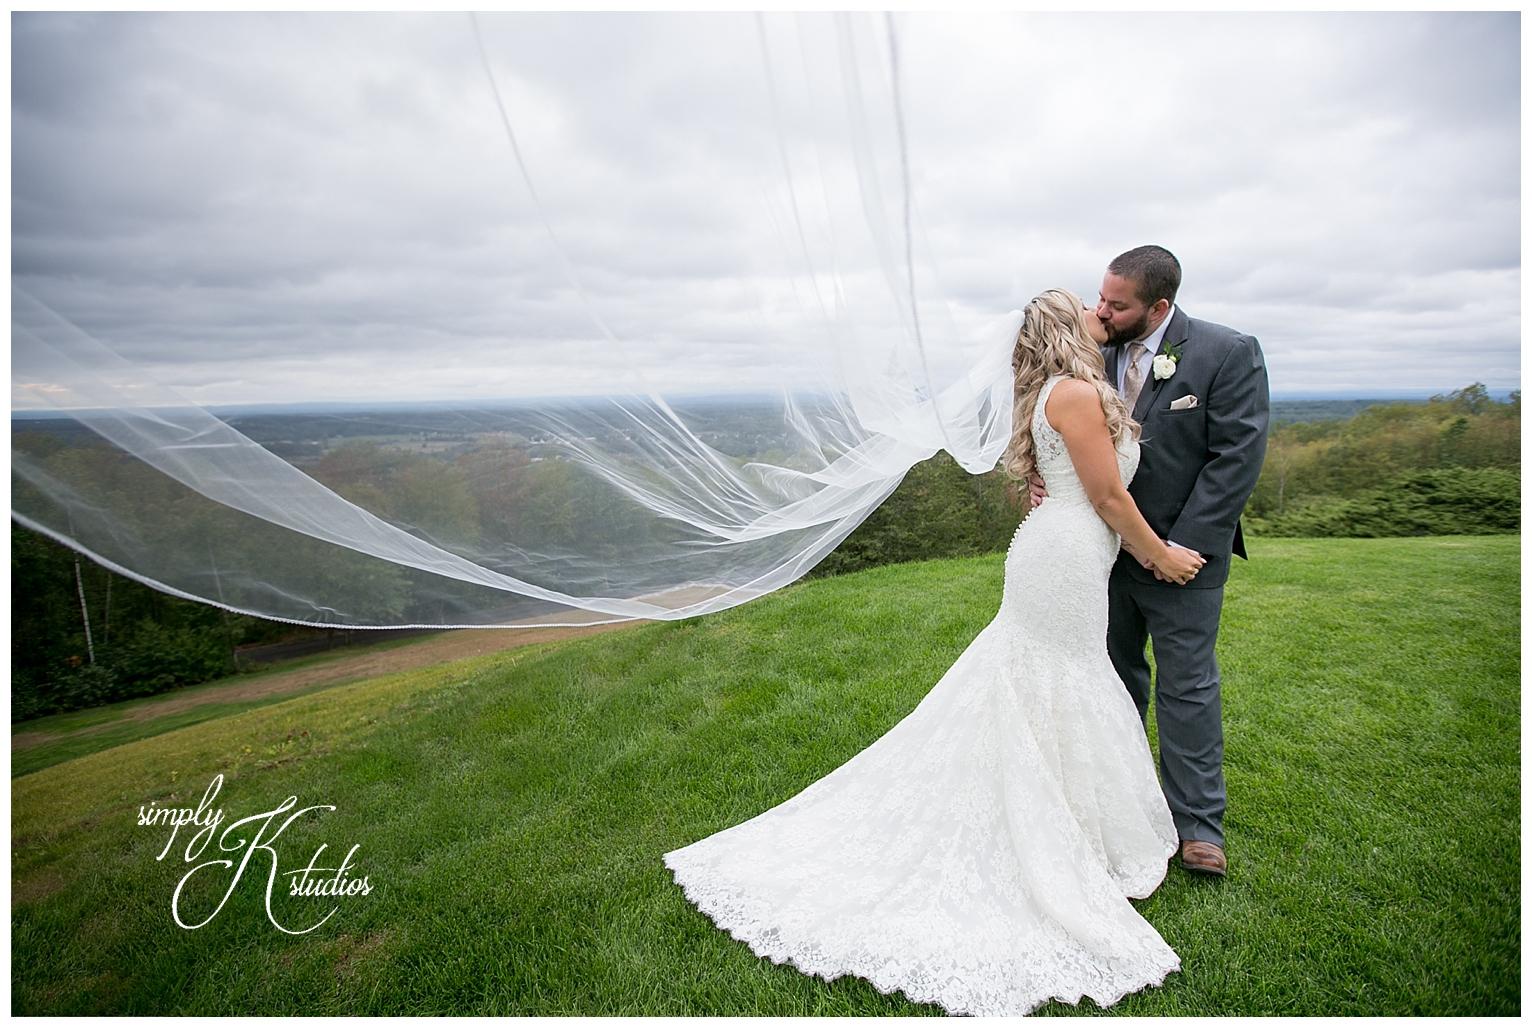 Boho Wedding Photographers in CT.jpg